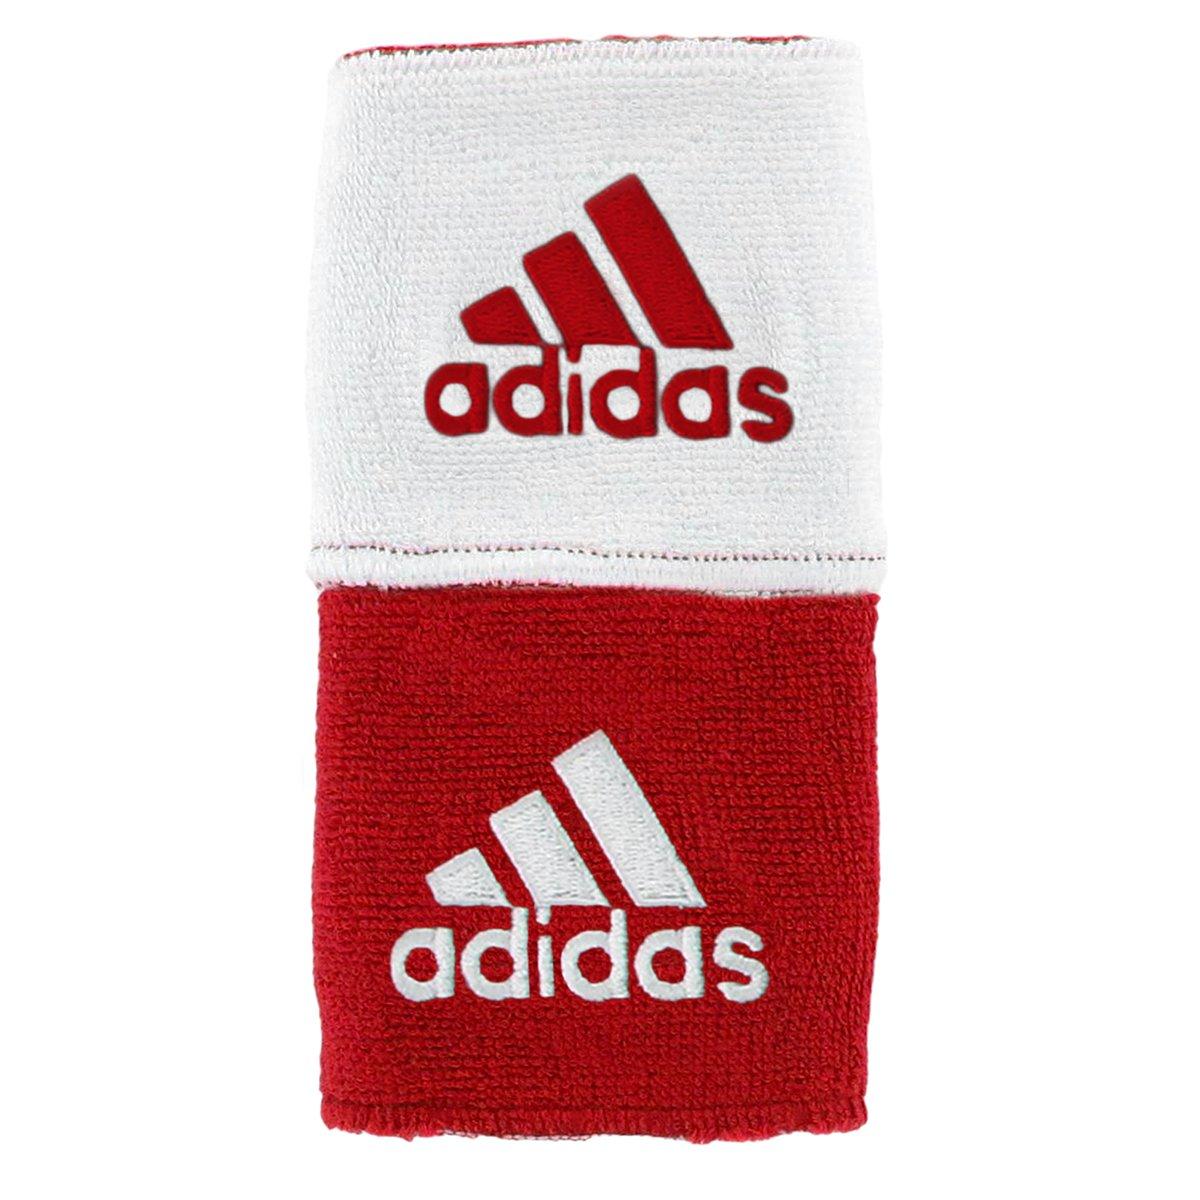 adidas Men's Interval Reversible Wristband 5133981